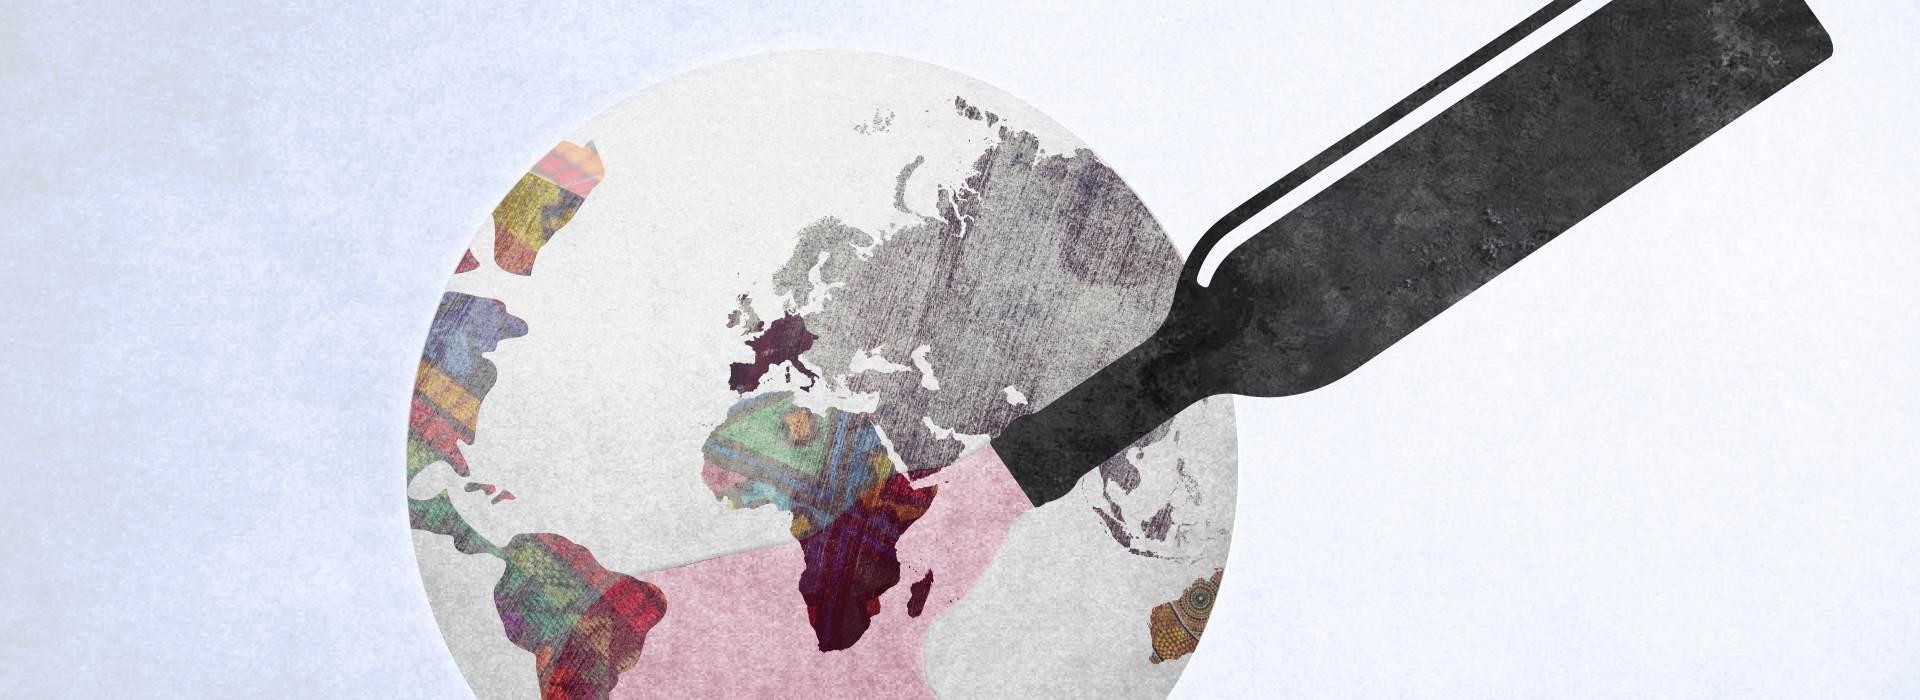 Around the world offers